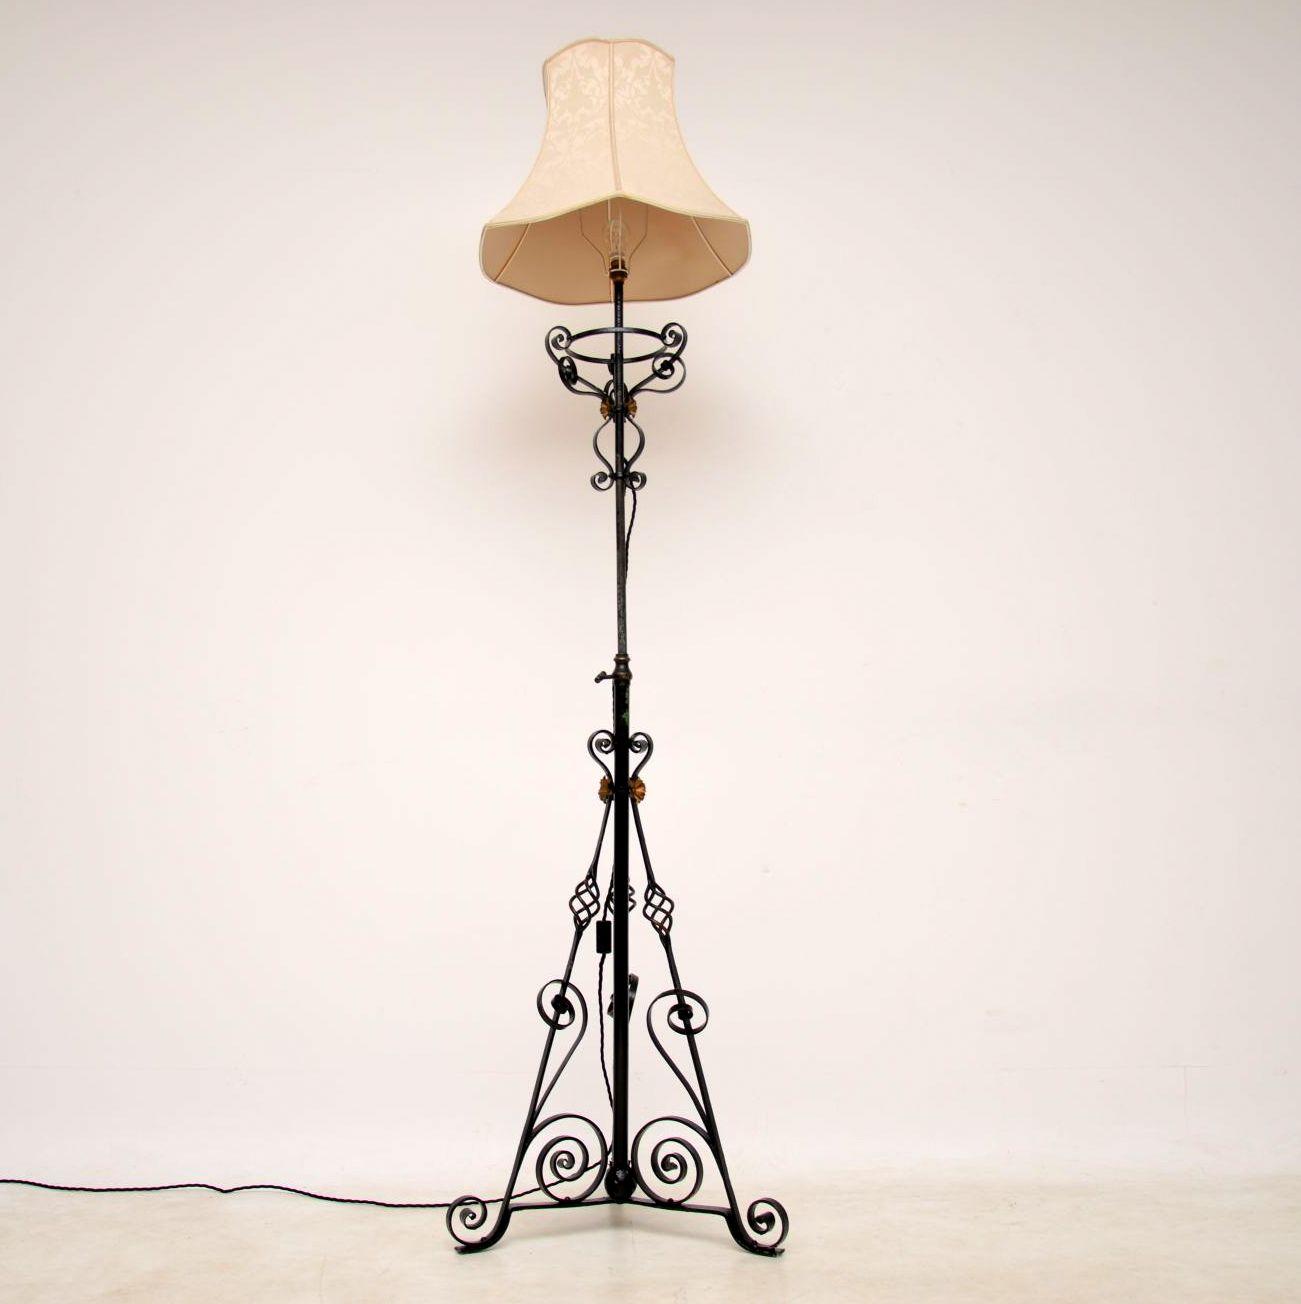 Antique Wrought Iron Telescopic Lamp